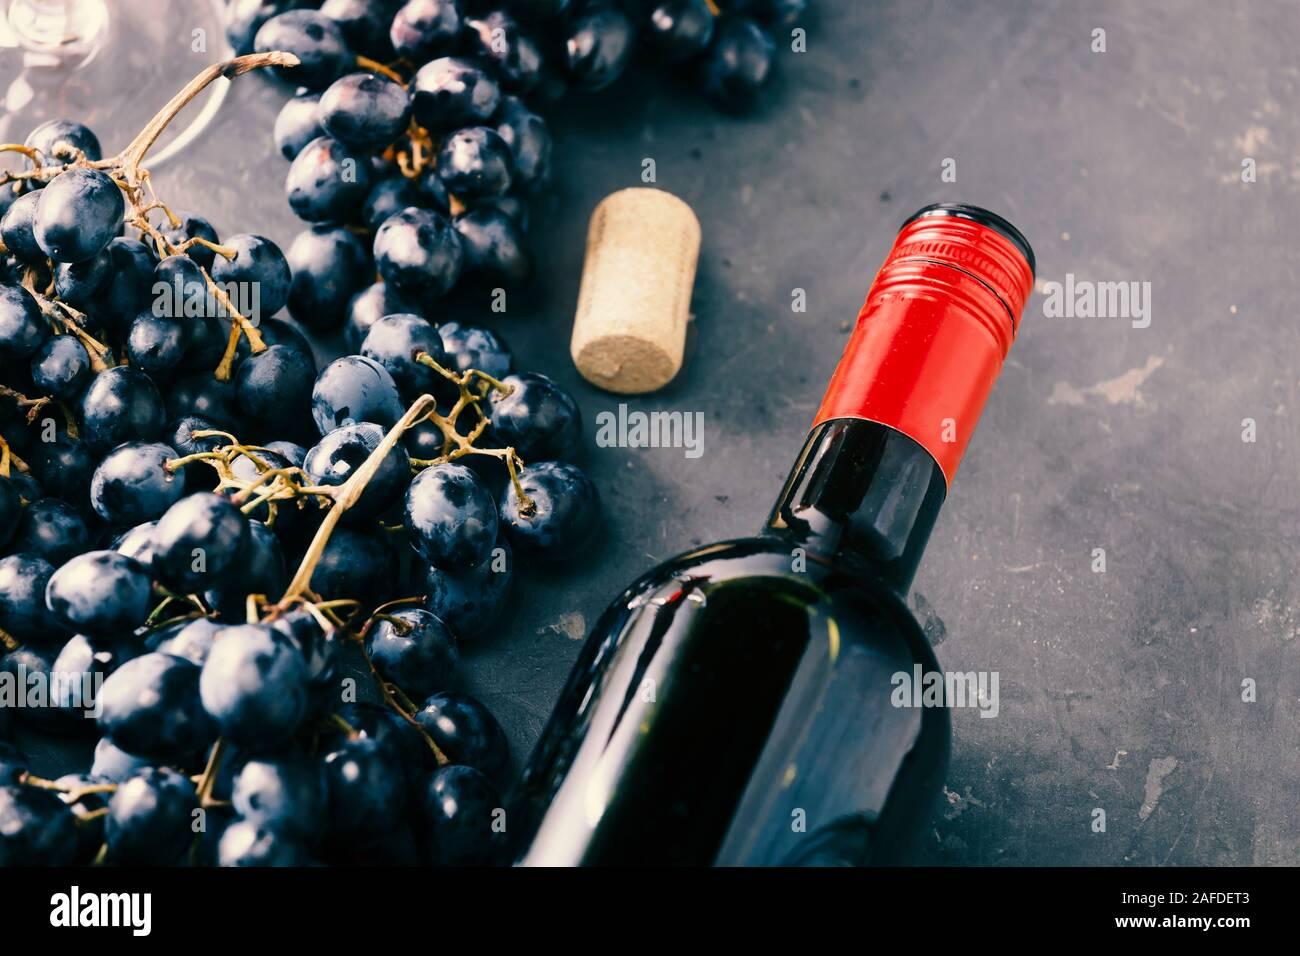 Chardonnay, Pinot noir, rosato, pinot, blume verdejo, note di degustazione, oddero, chardonnay, dono Foto Stock